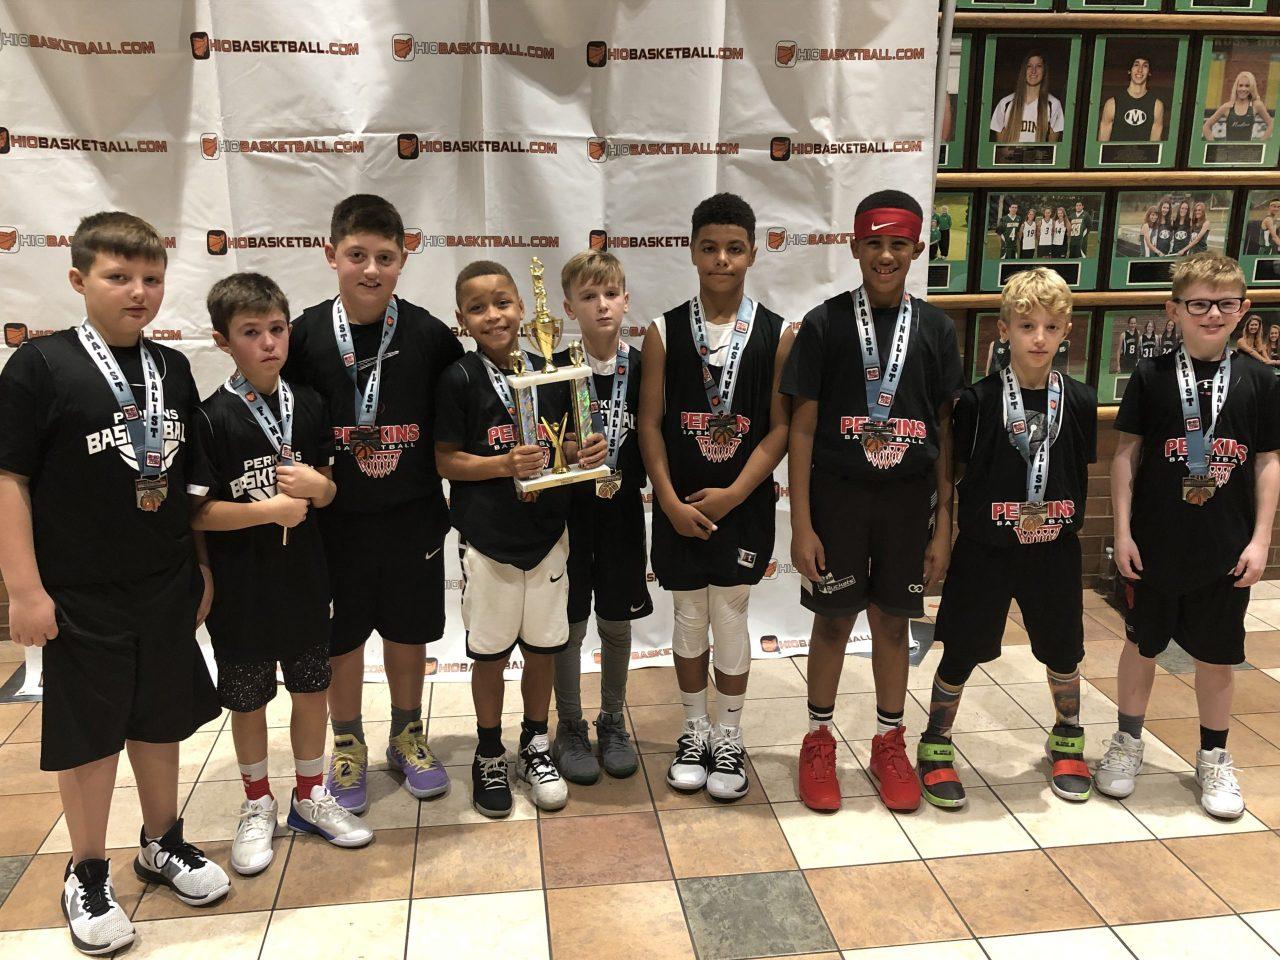 4th Boys Gold Runner-Up perkins pirates